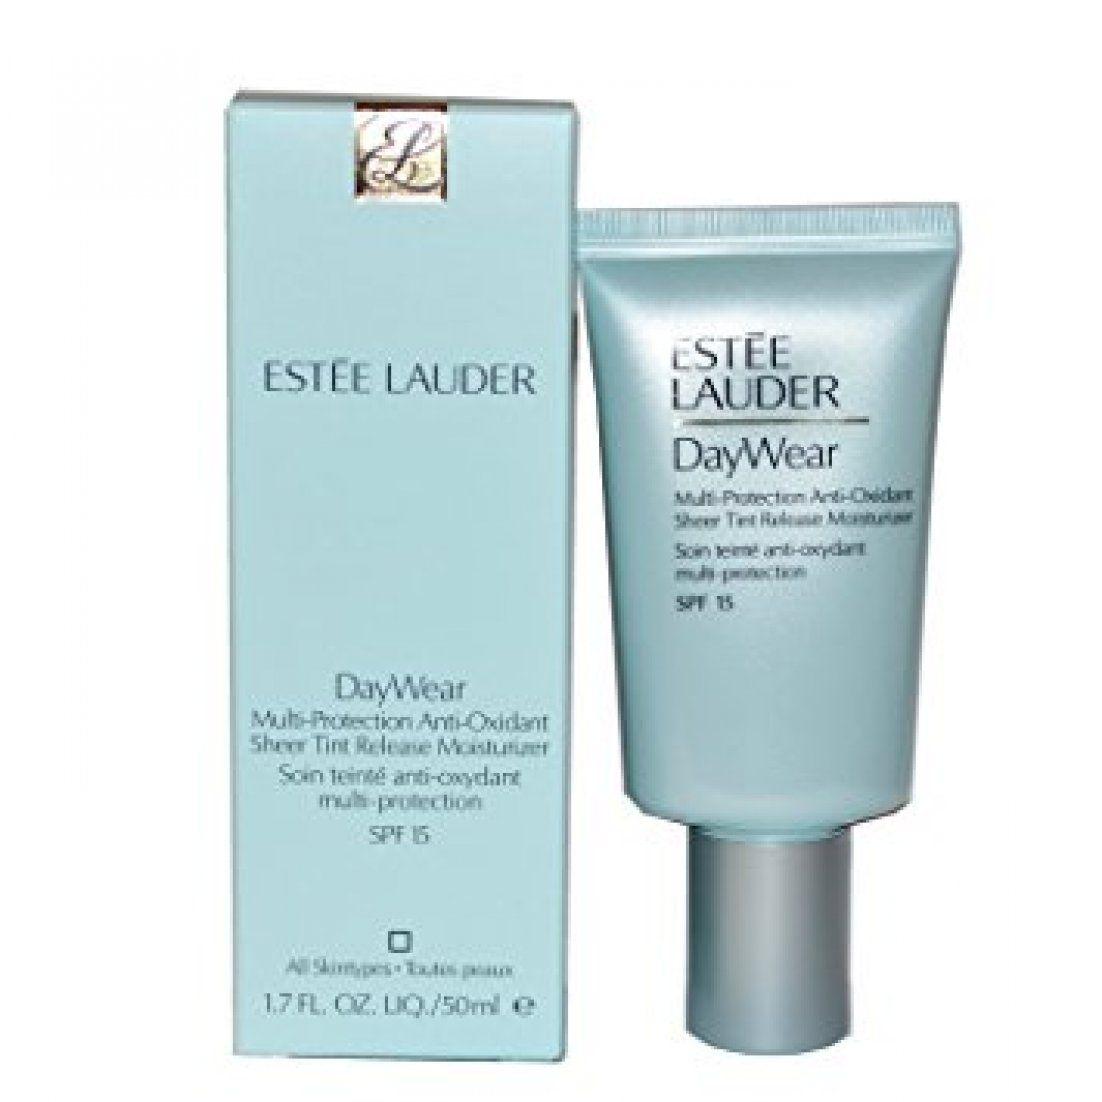 Estee Lauder Daywear Multi Protection Anti Oxidant Sheer Tint Release Moisturizer Spf15 50ml In 2020 Estee Estee Lauder Moisturizer